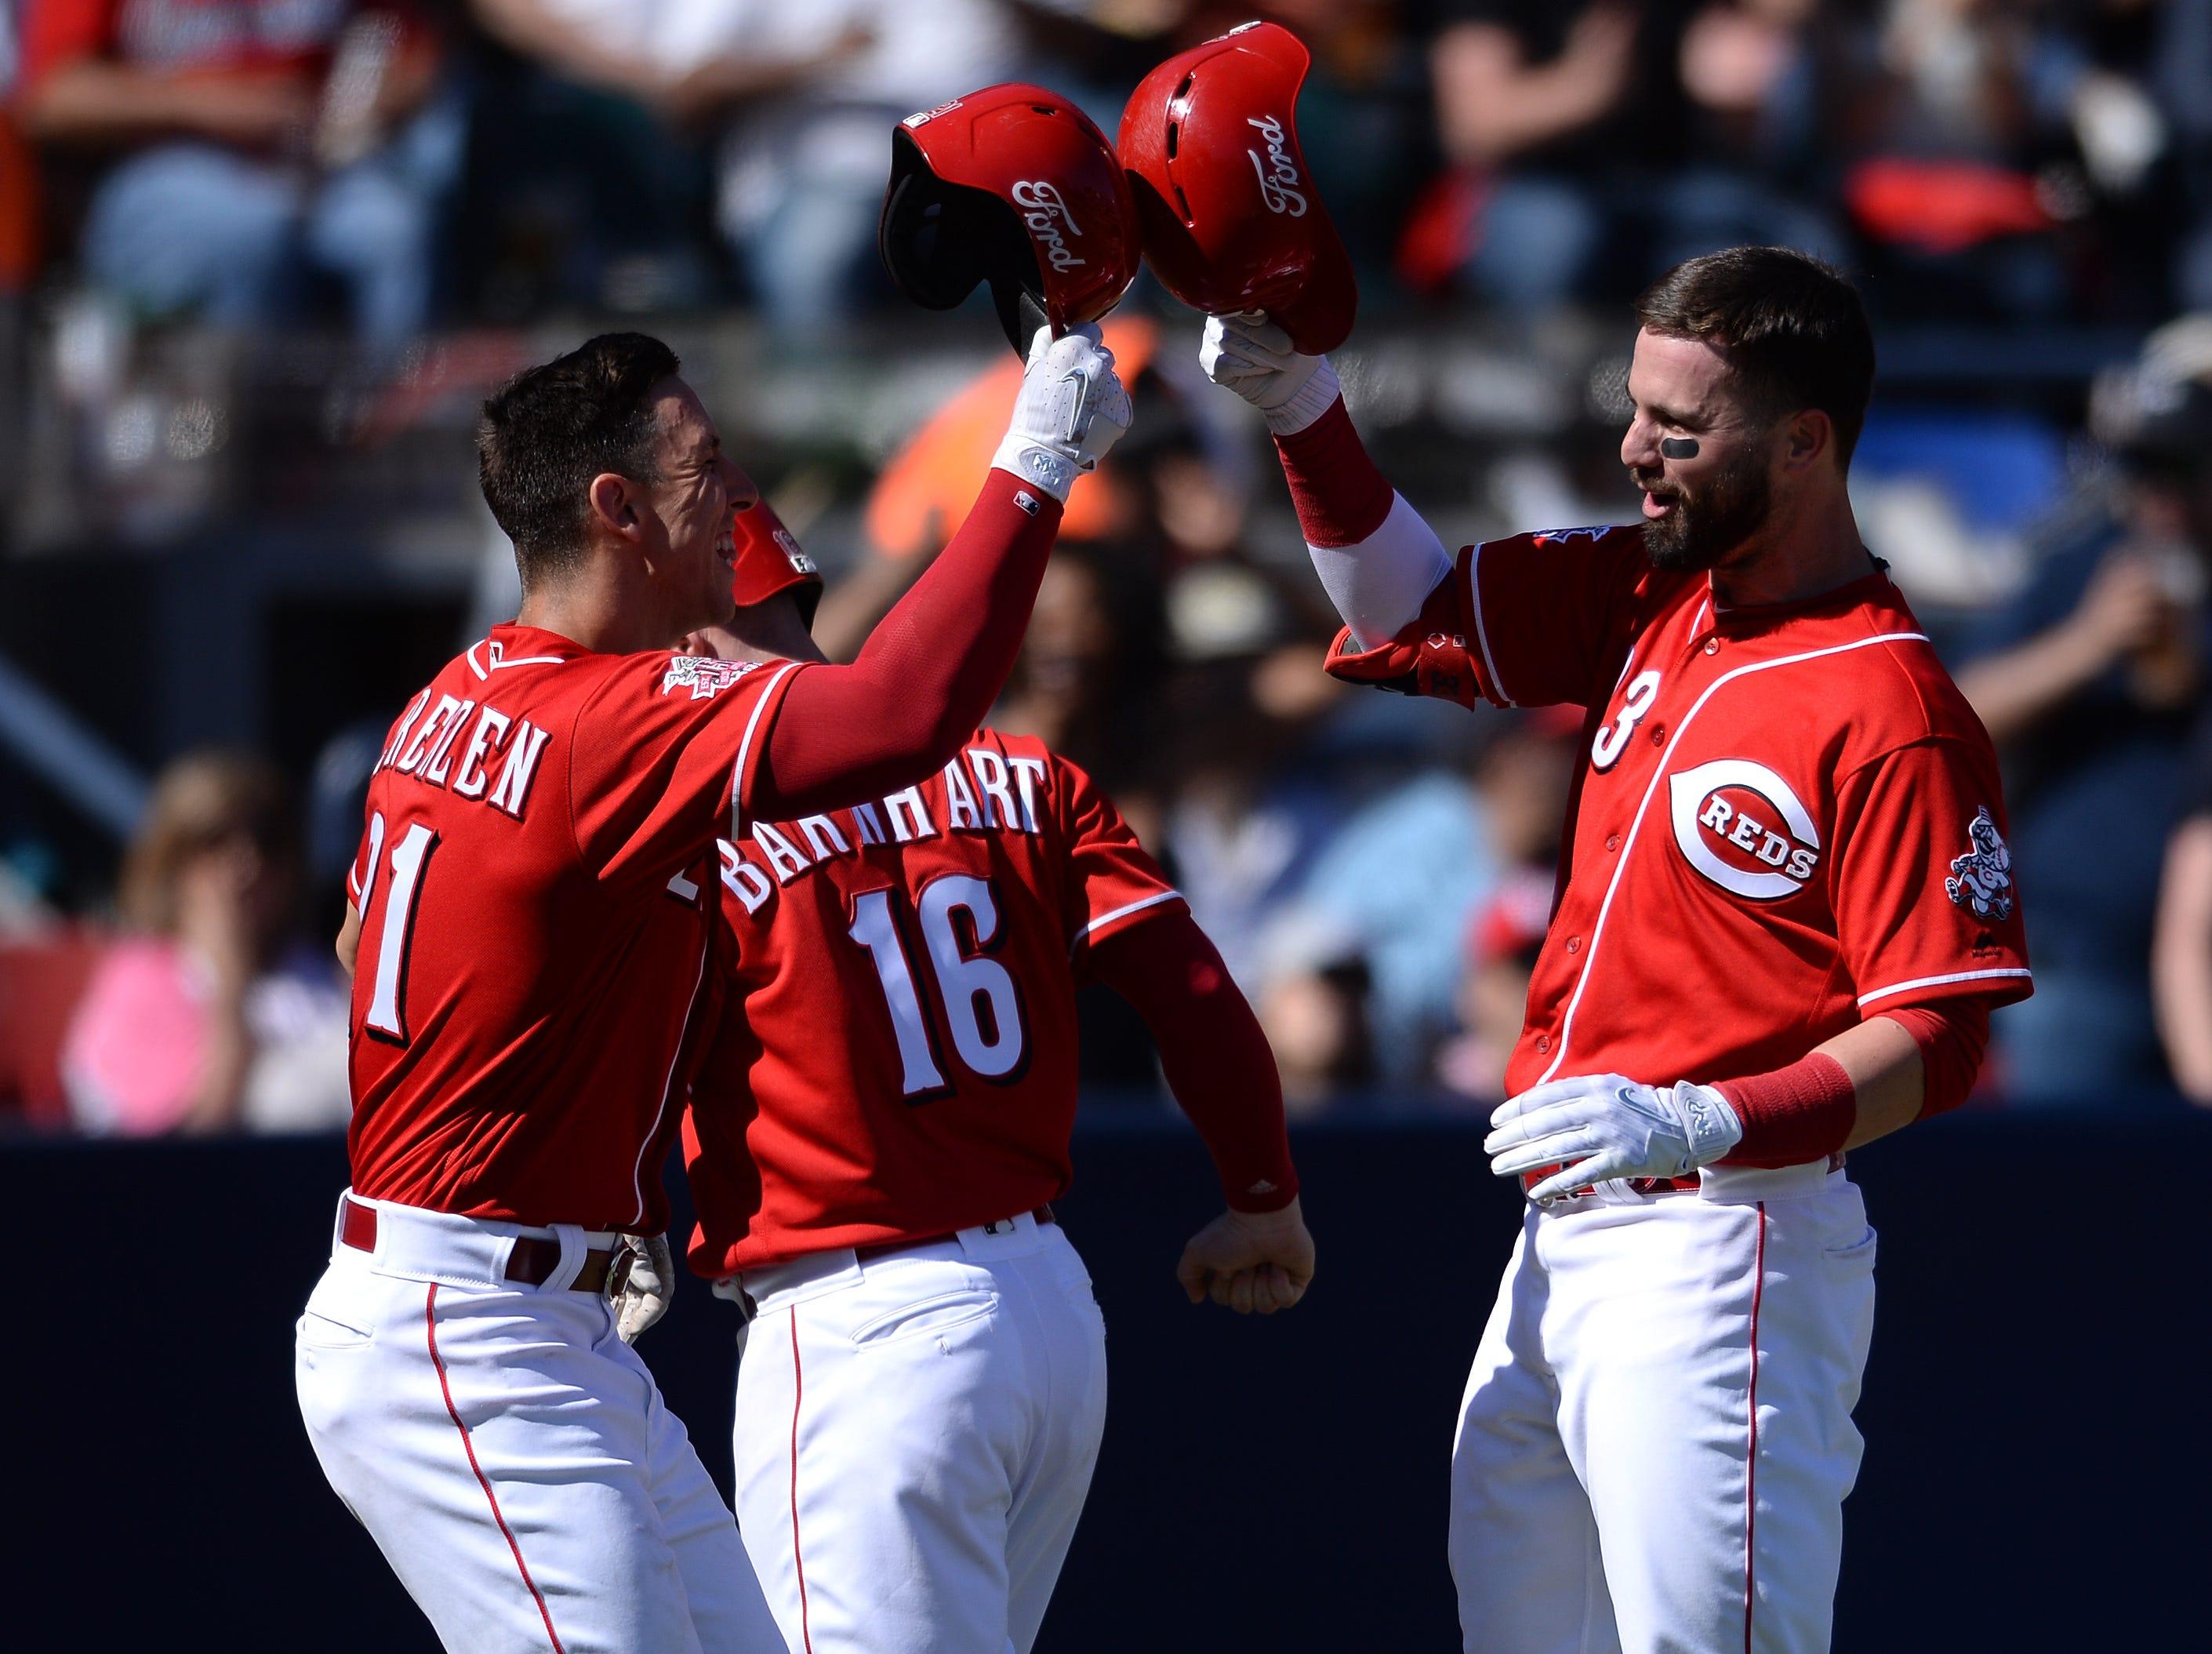 Cincinnati Reds left fielder Jesse Winker (33) is congratulated by relief pitcher Michael Lorenzen (21) after hitting a three run home run during the fifth inning against the St. Louis Cardinals at Estadio de Beisbol Monterrey.